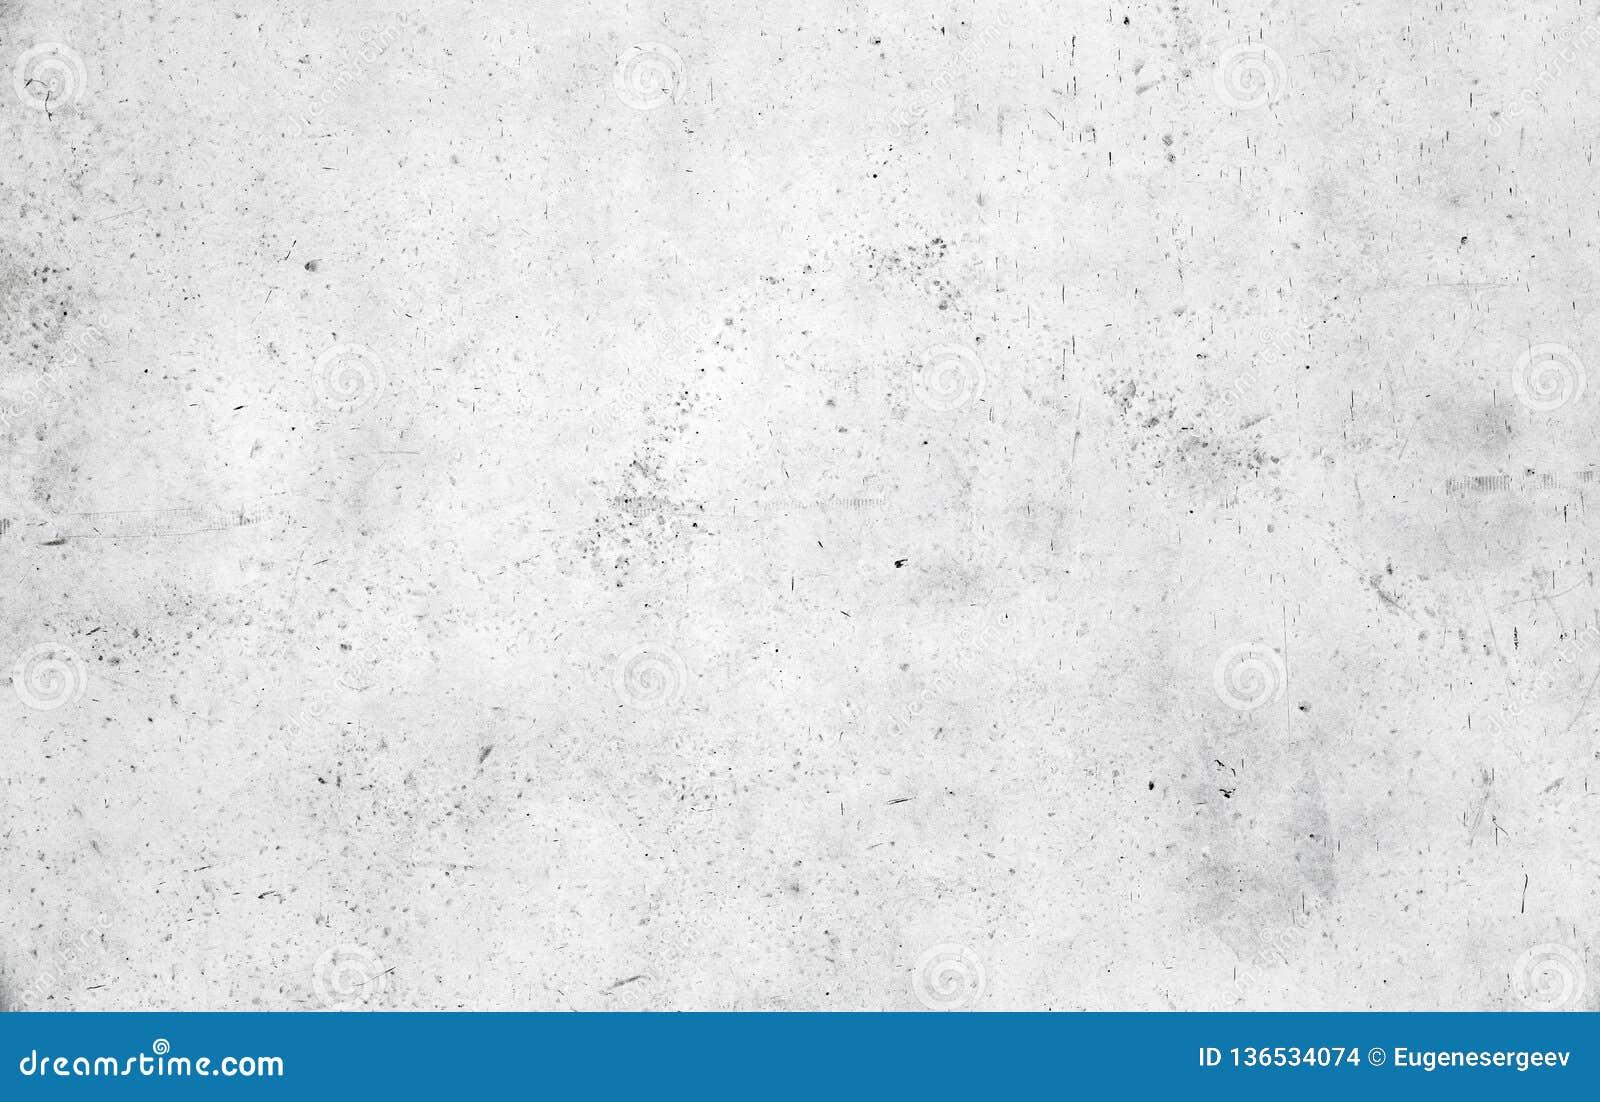 Textura branca vazia do muro de cimento